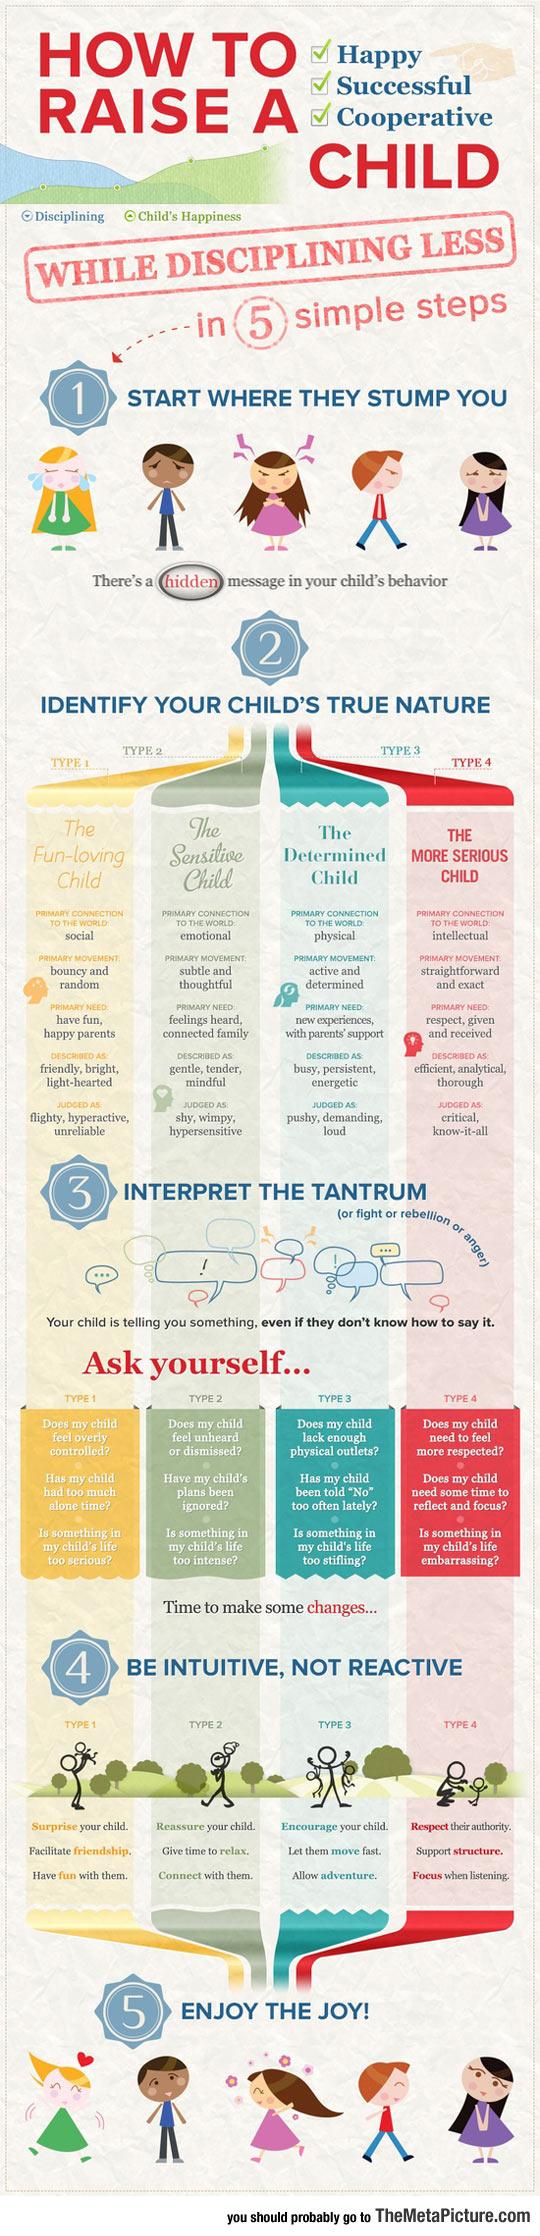 infographic-raise-child-education-disciplining